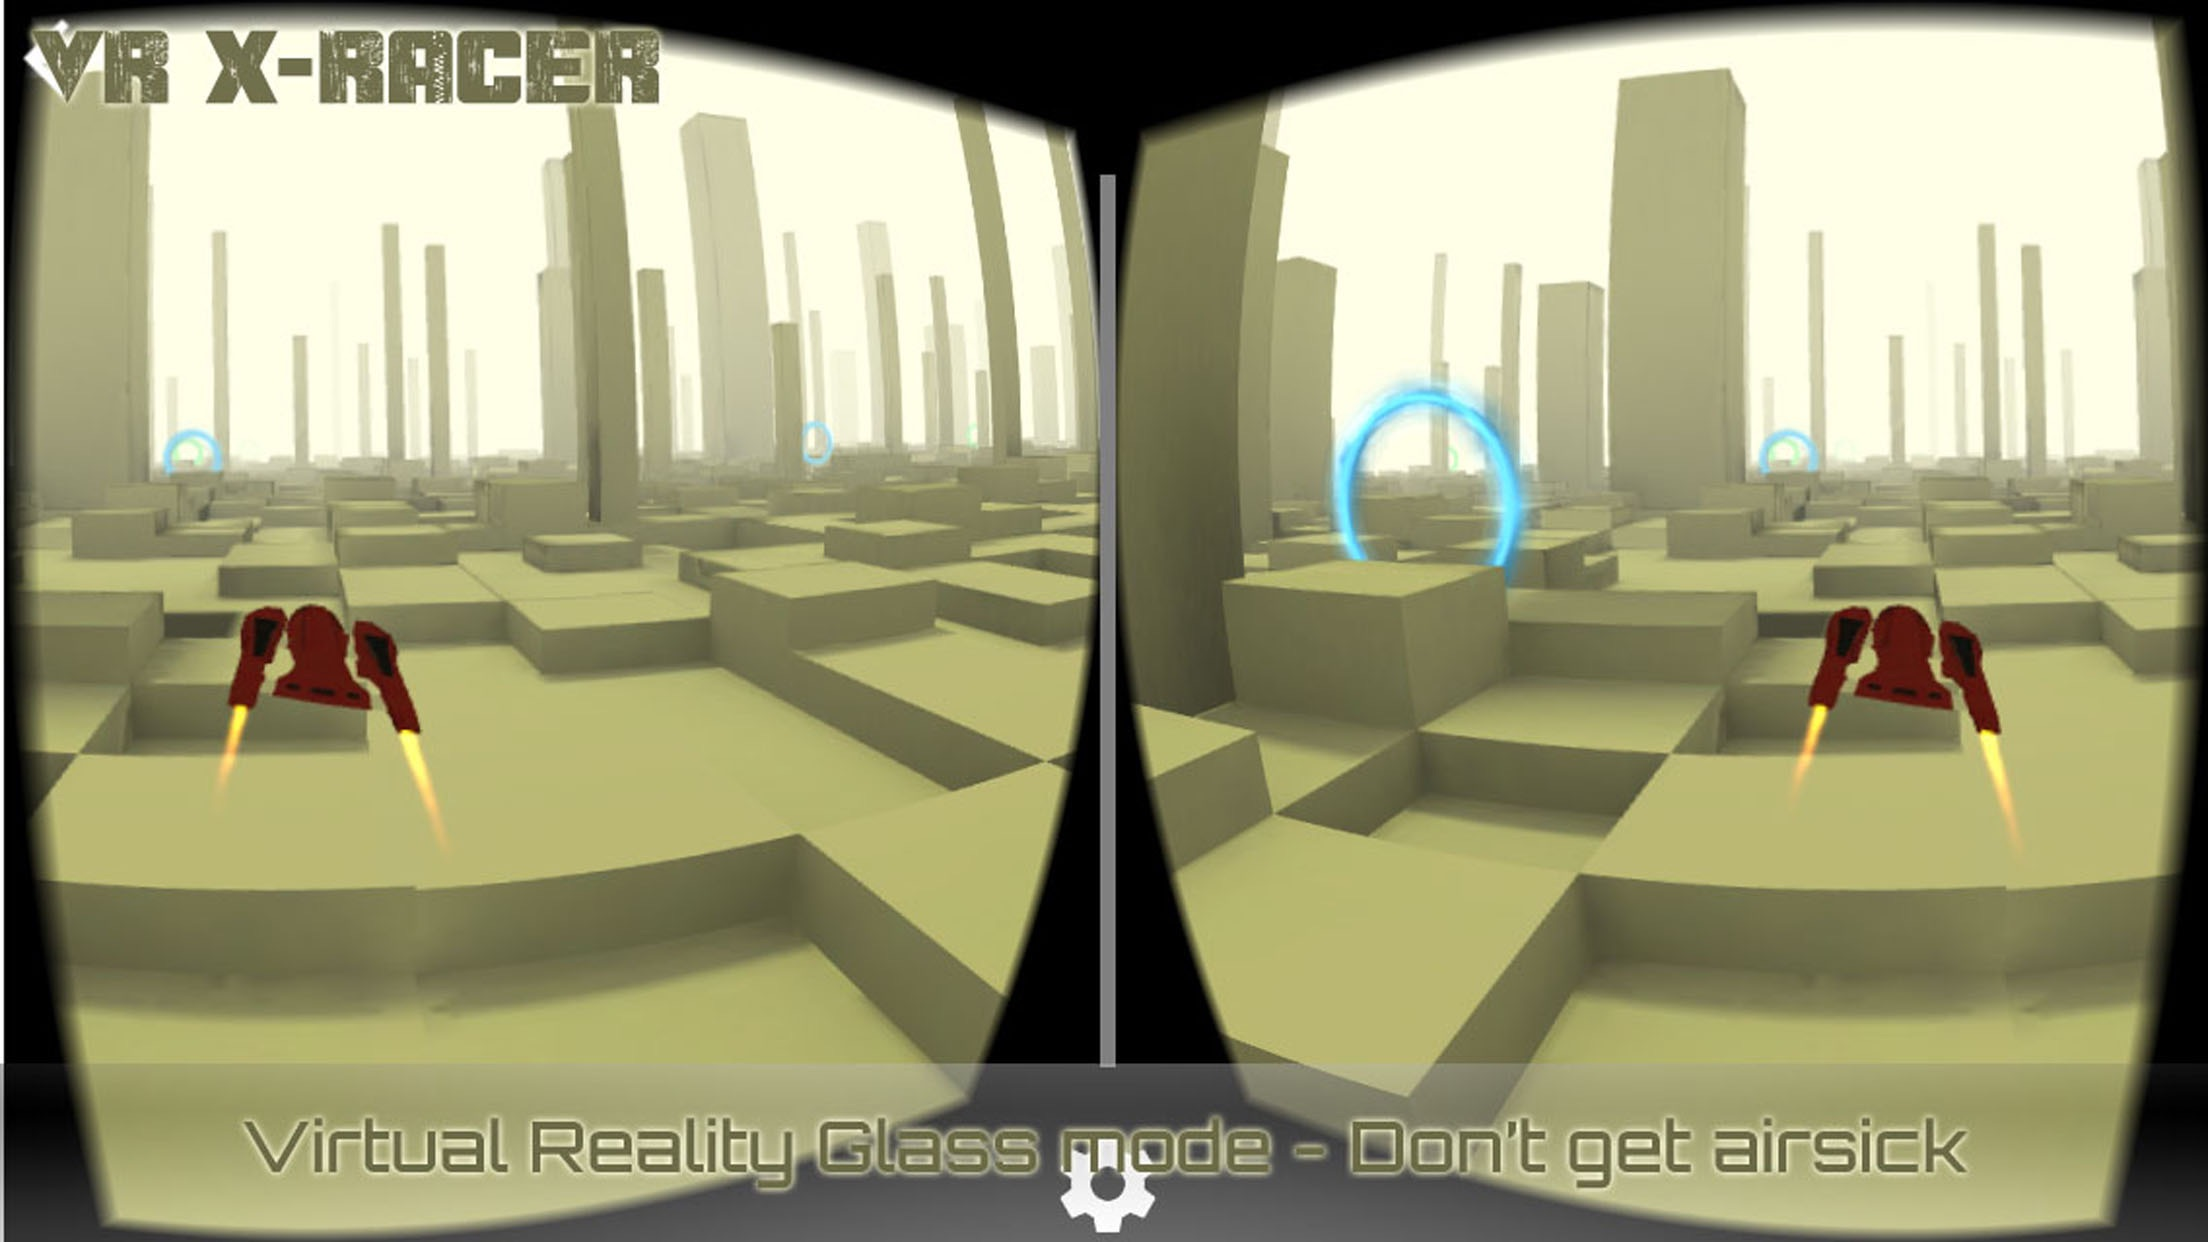 VR XRacer: virtual reality space racing vr games Screenshot